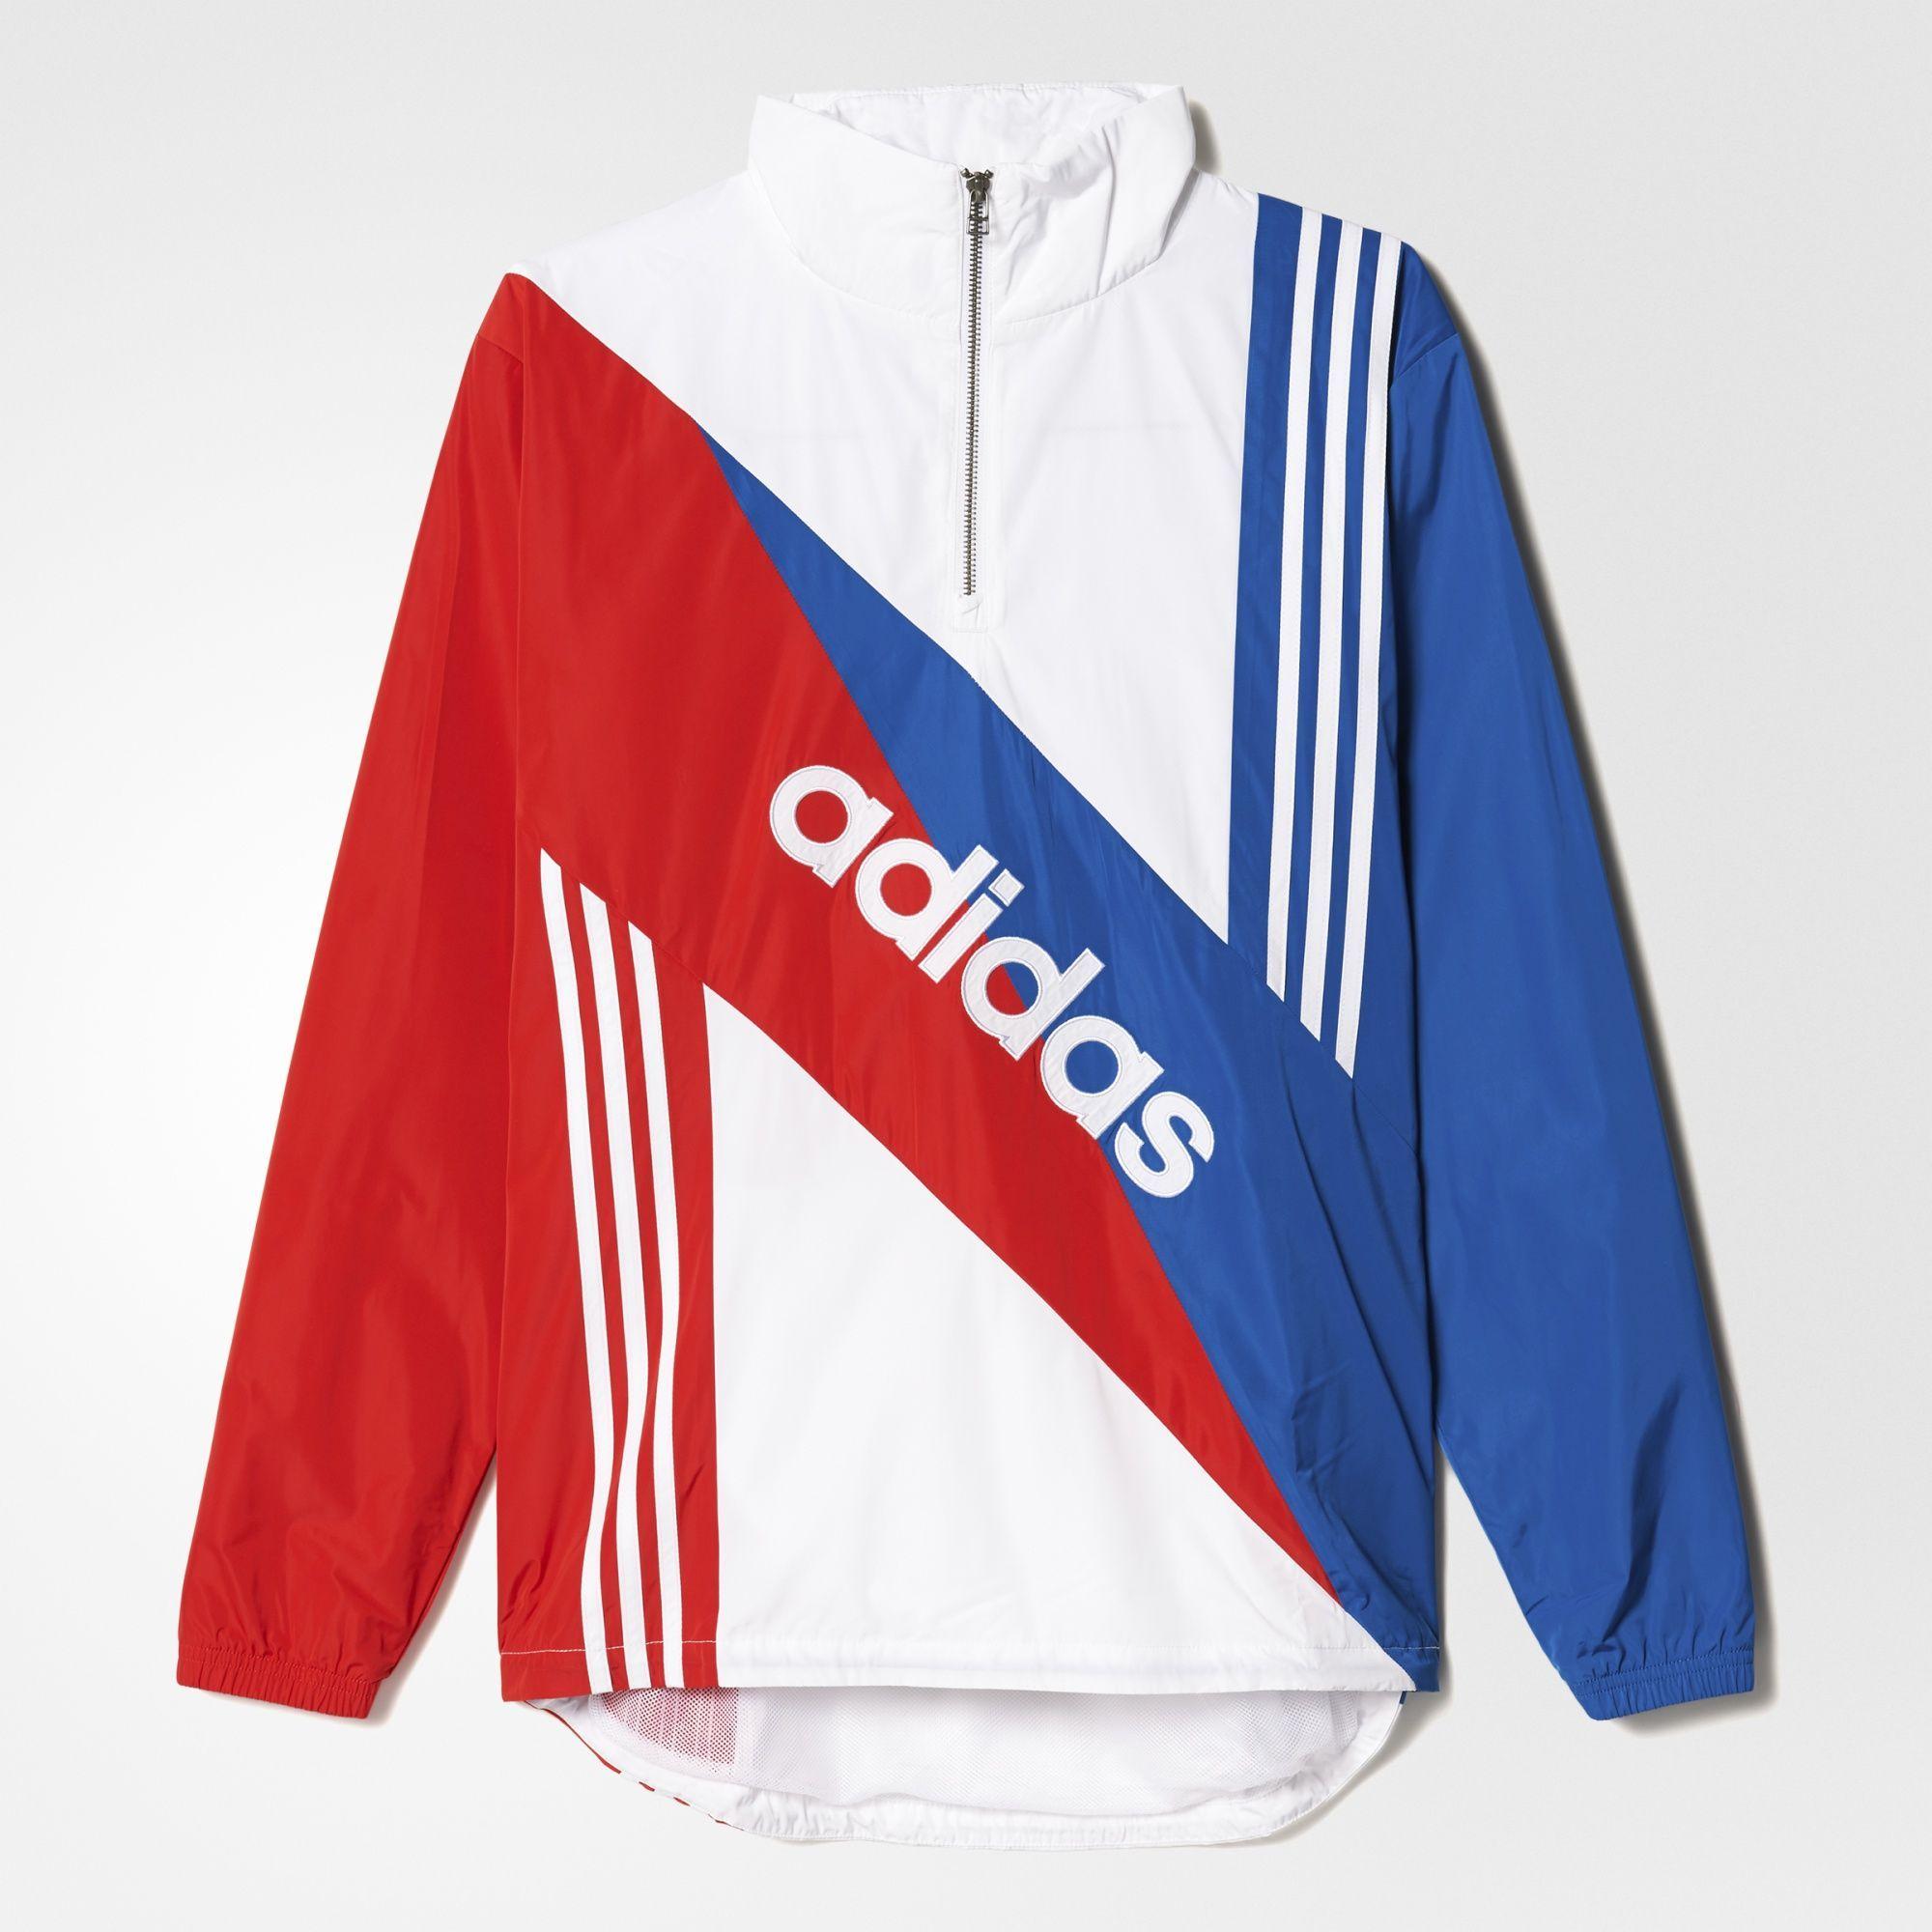 Rompevientos Retro Linear | Wear me | Adidas, Raincoat